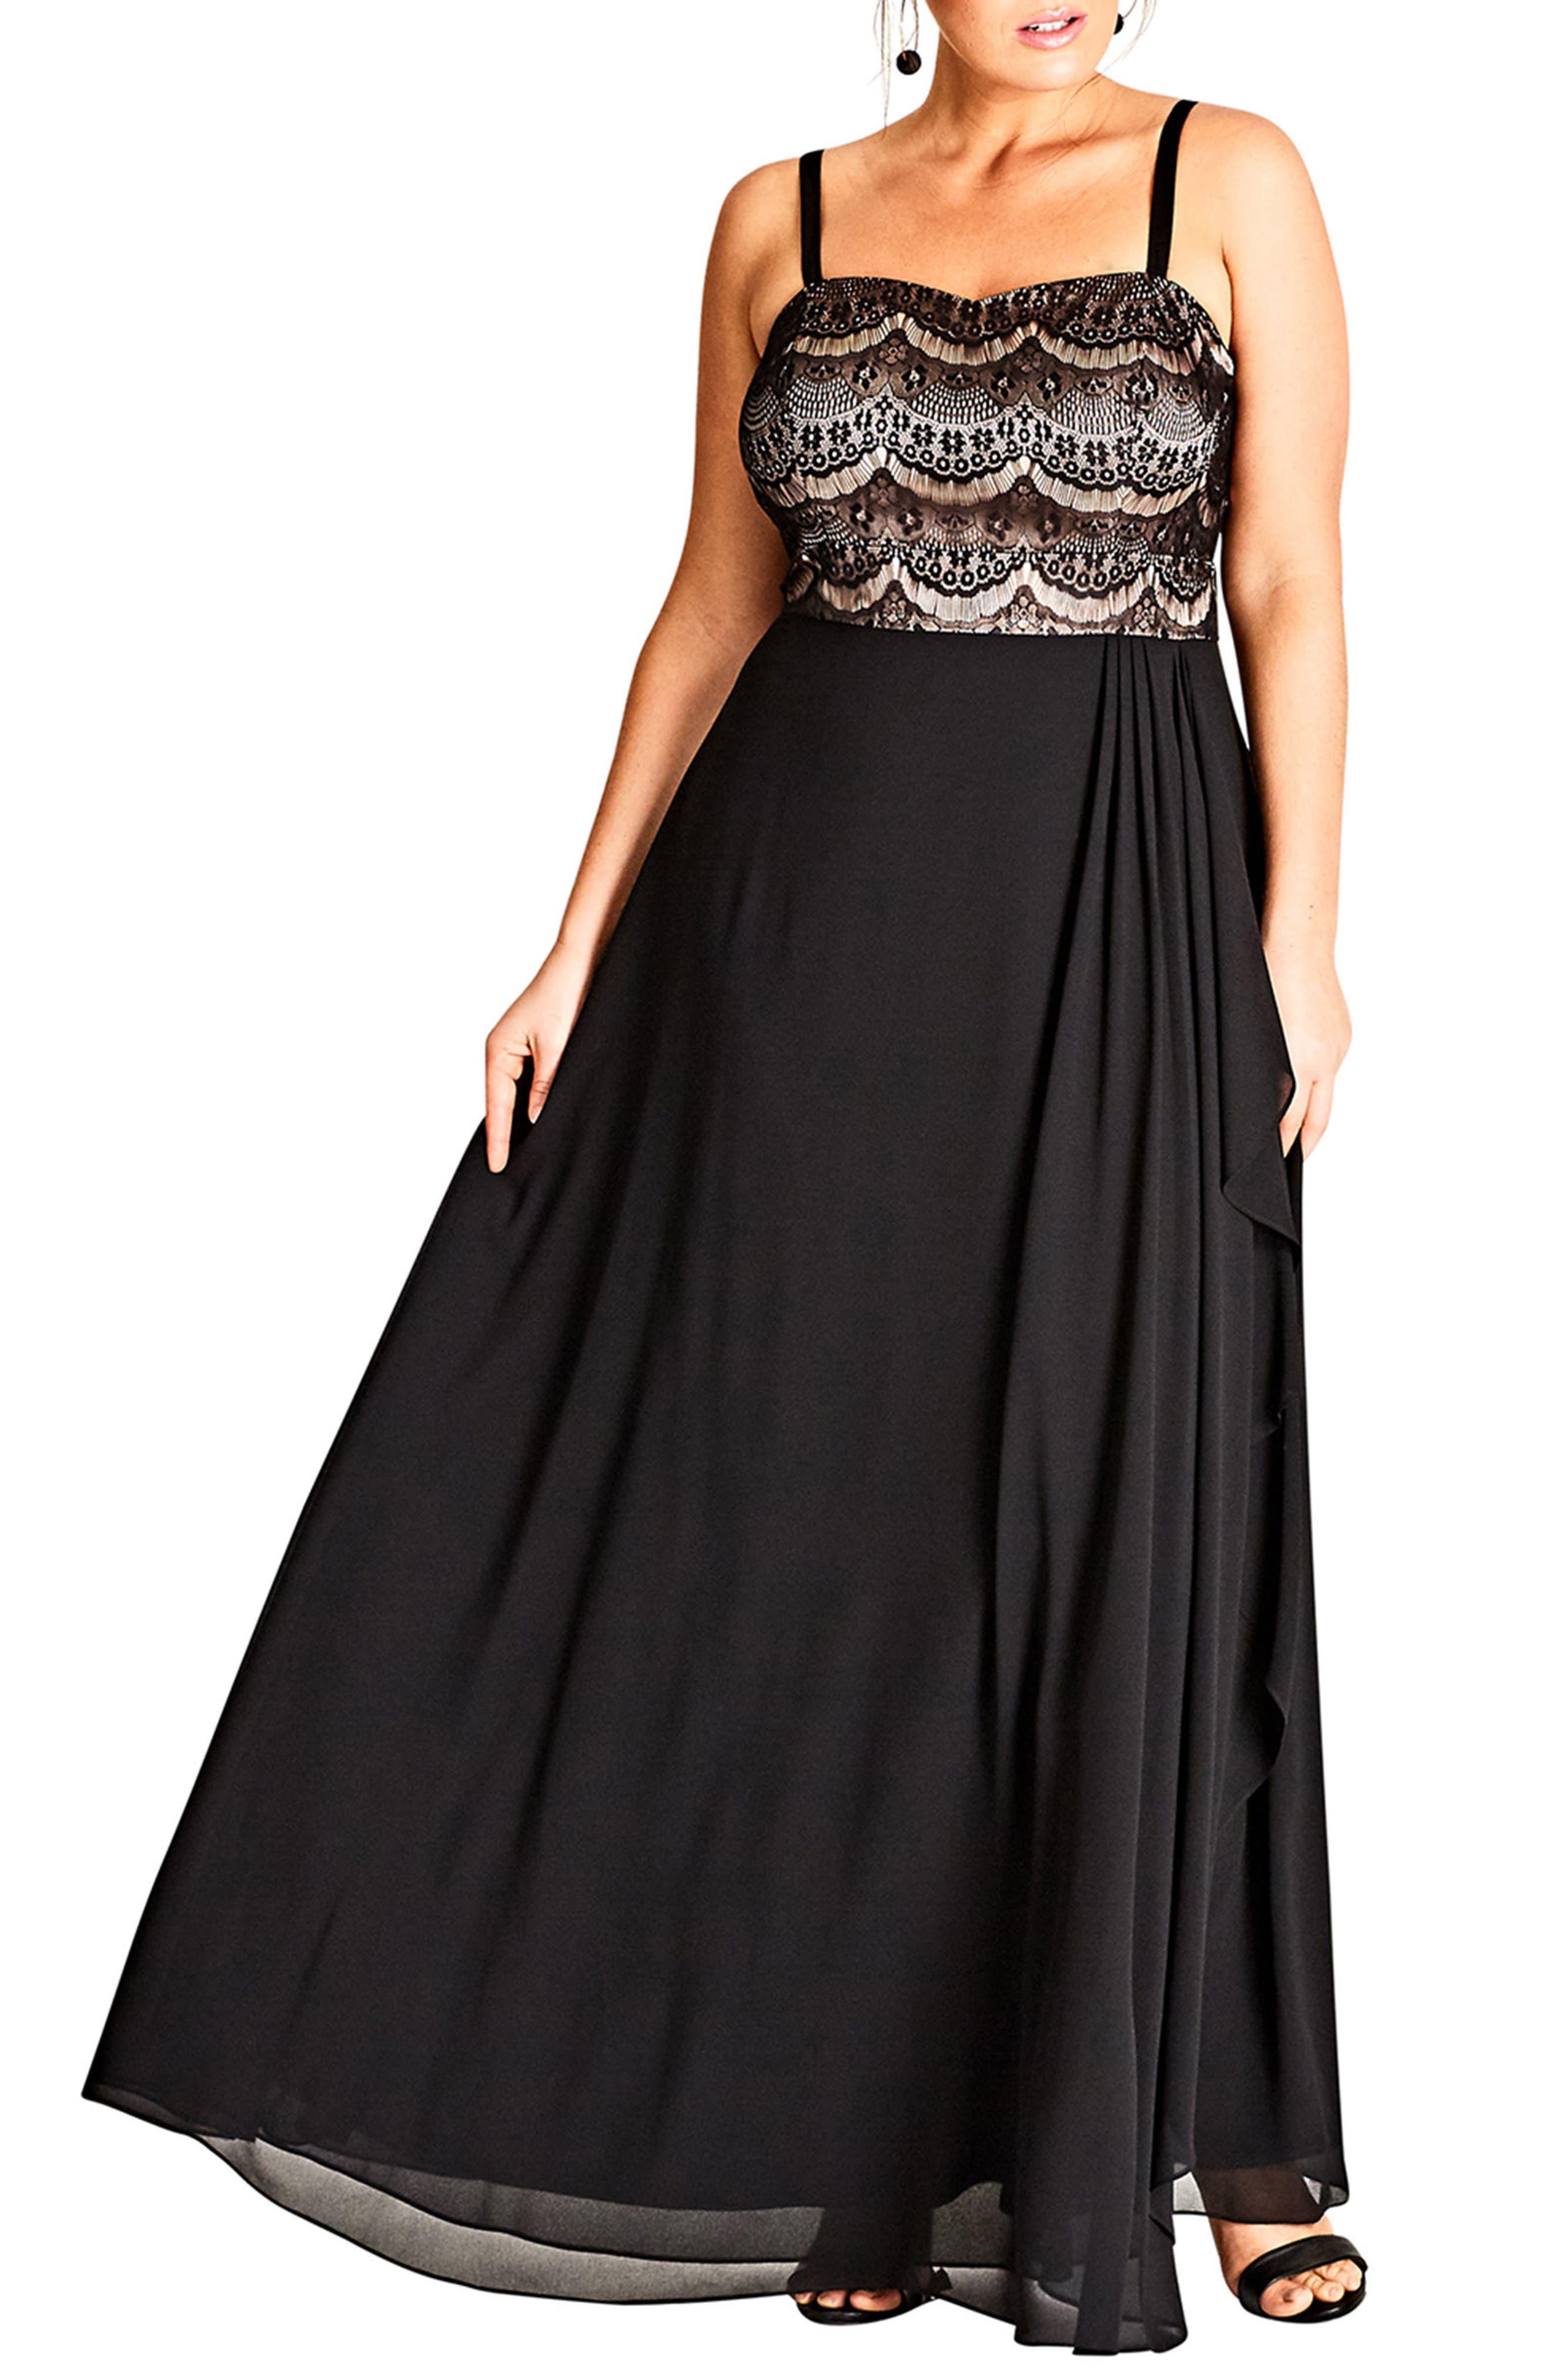 City Chic Eyelash Ebony Lace & Chiffon Gown (Plus Size)